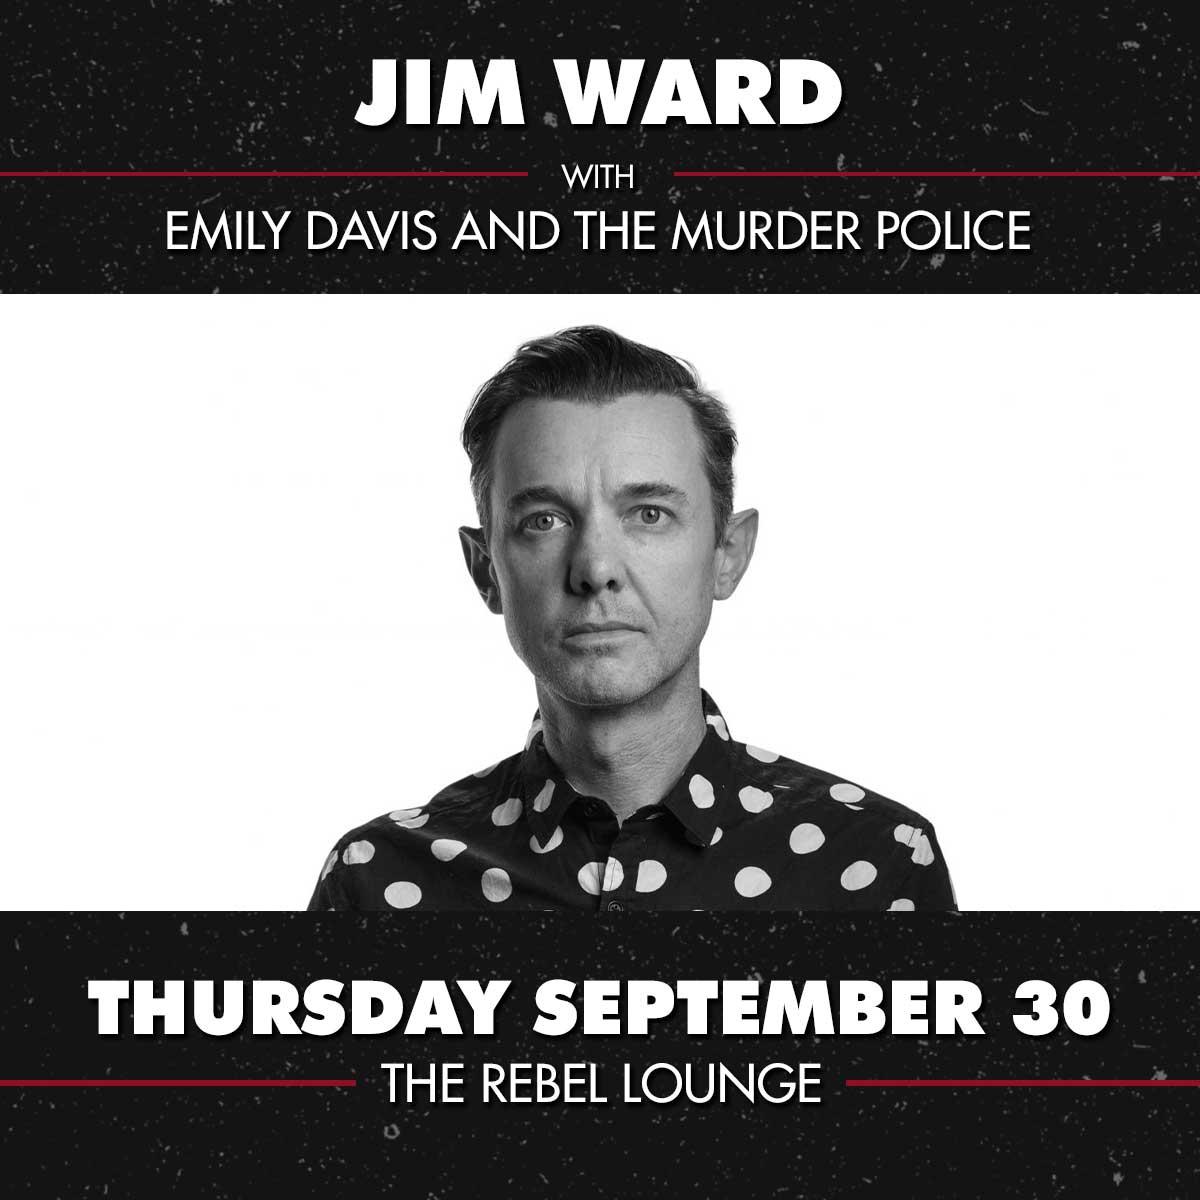 JIM WARD: